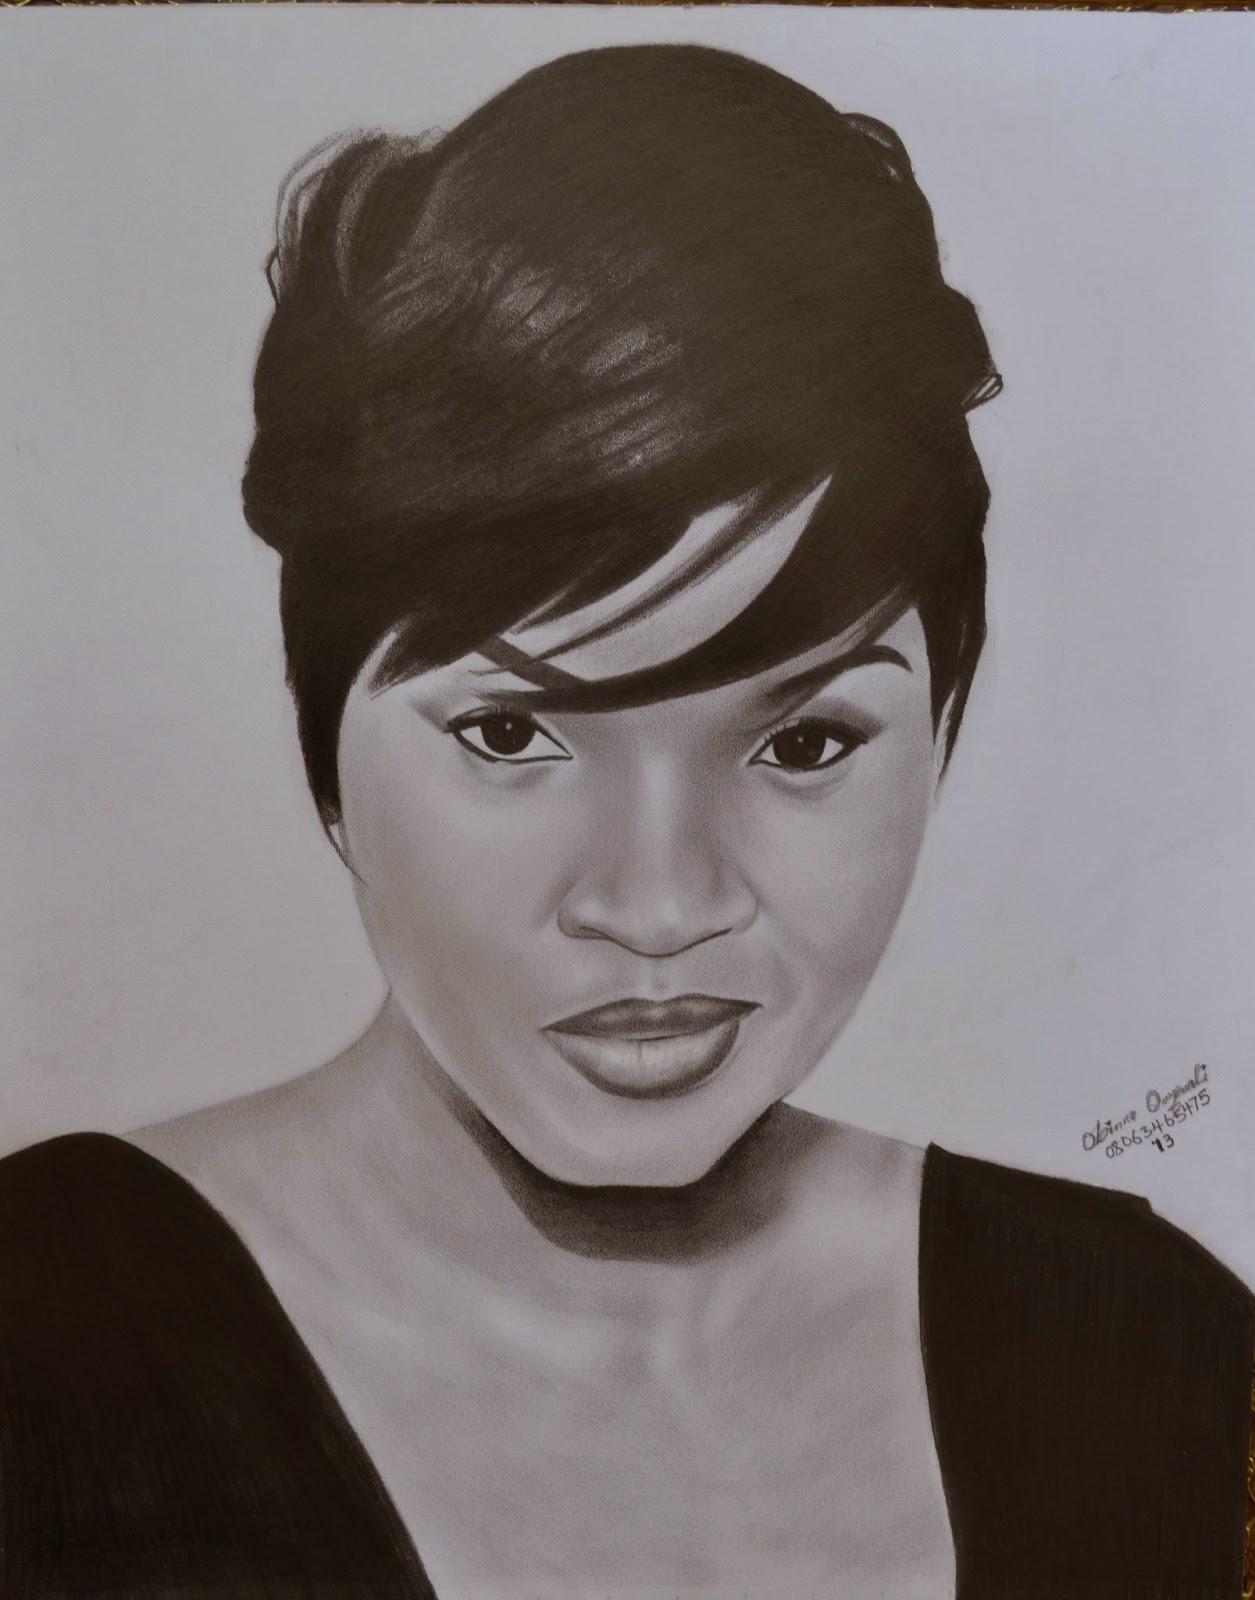 Nigerian actress Omotola's realistic pencil drawing